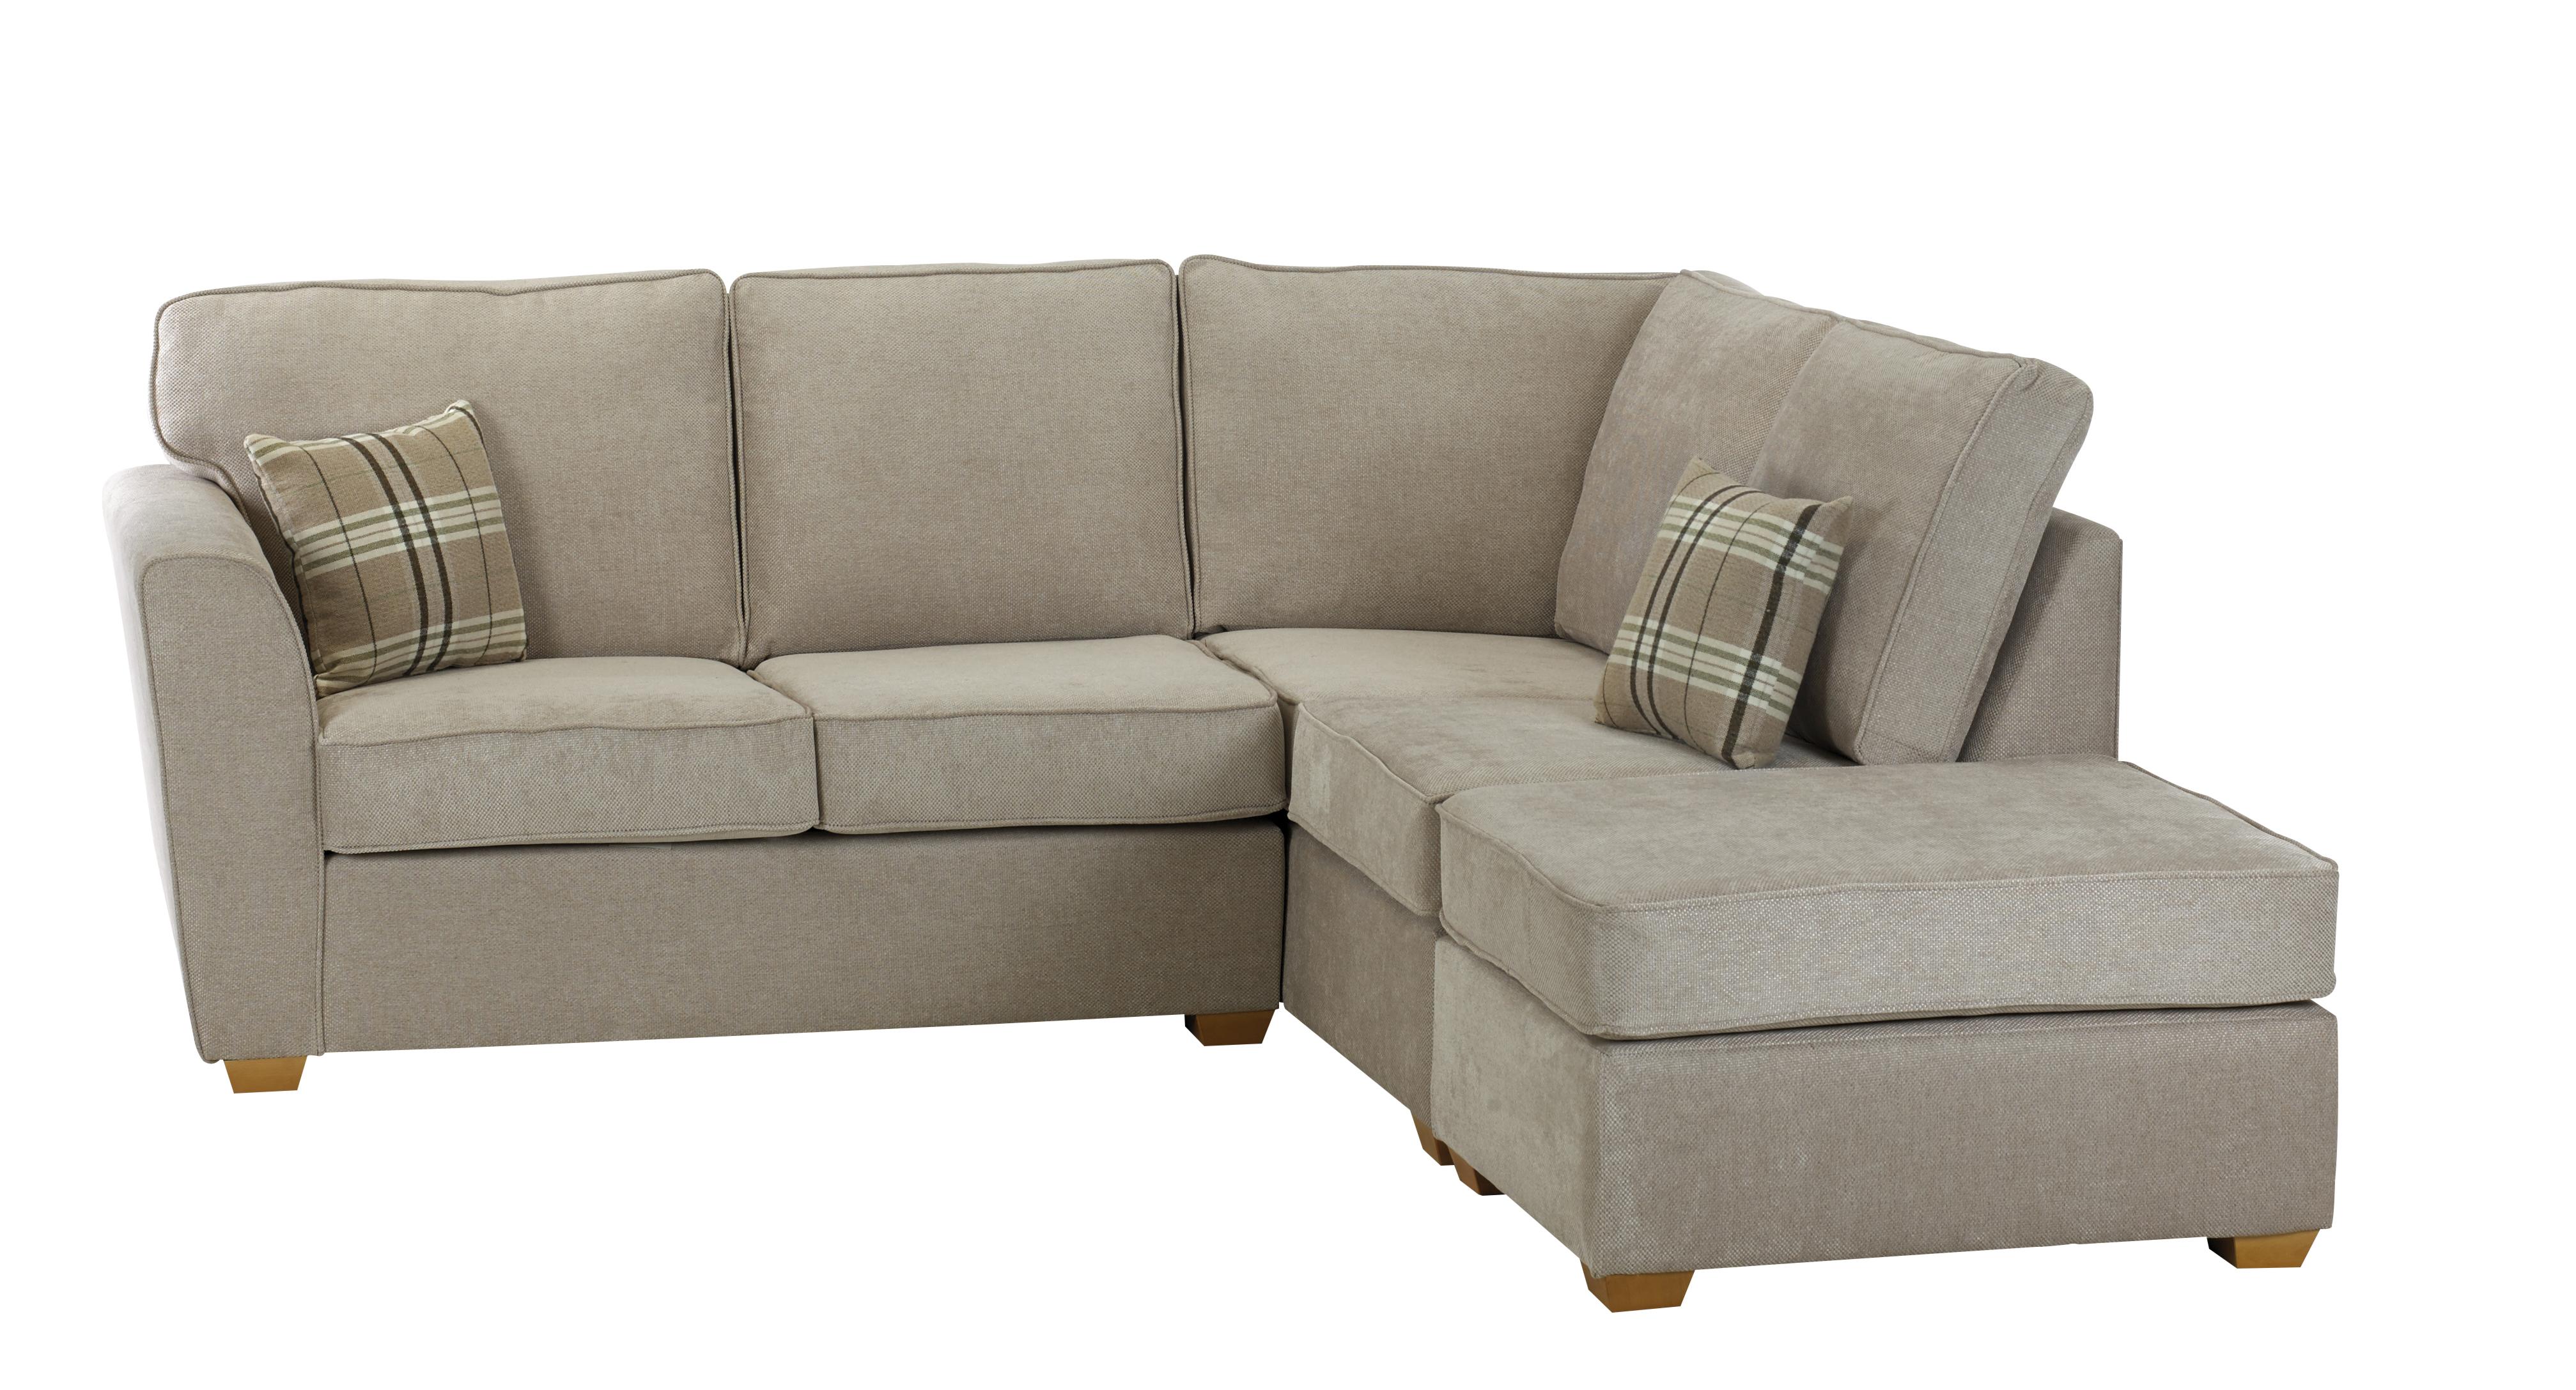 Indigo Sofa U0026 Chairs. £859.00